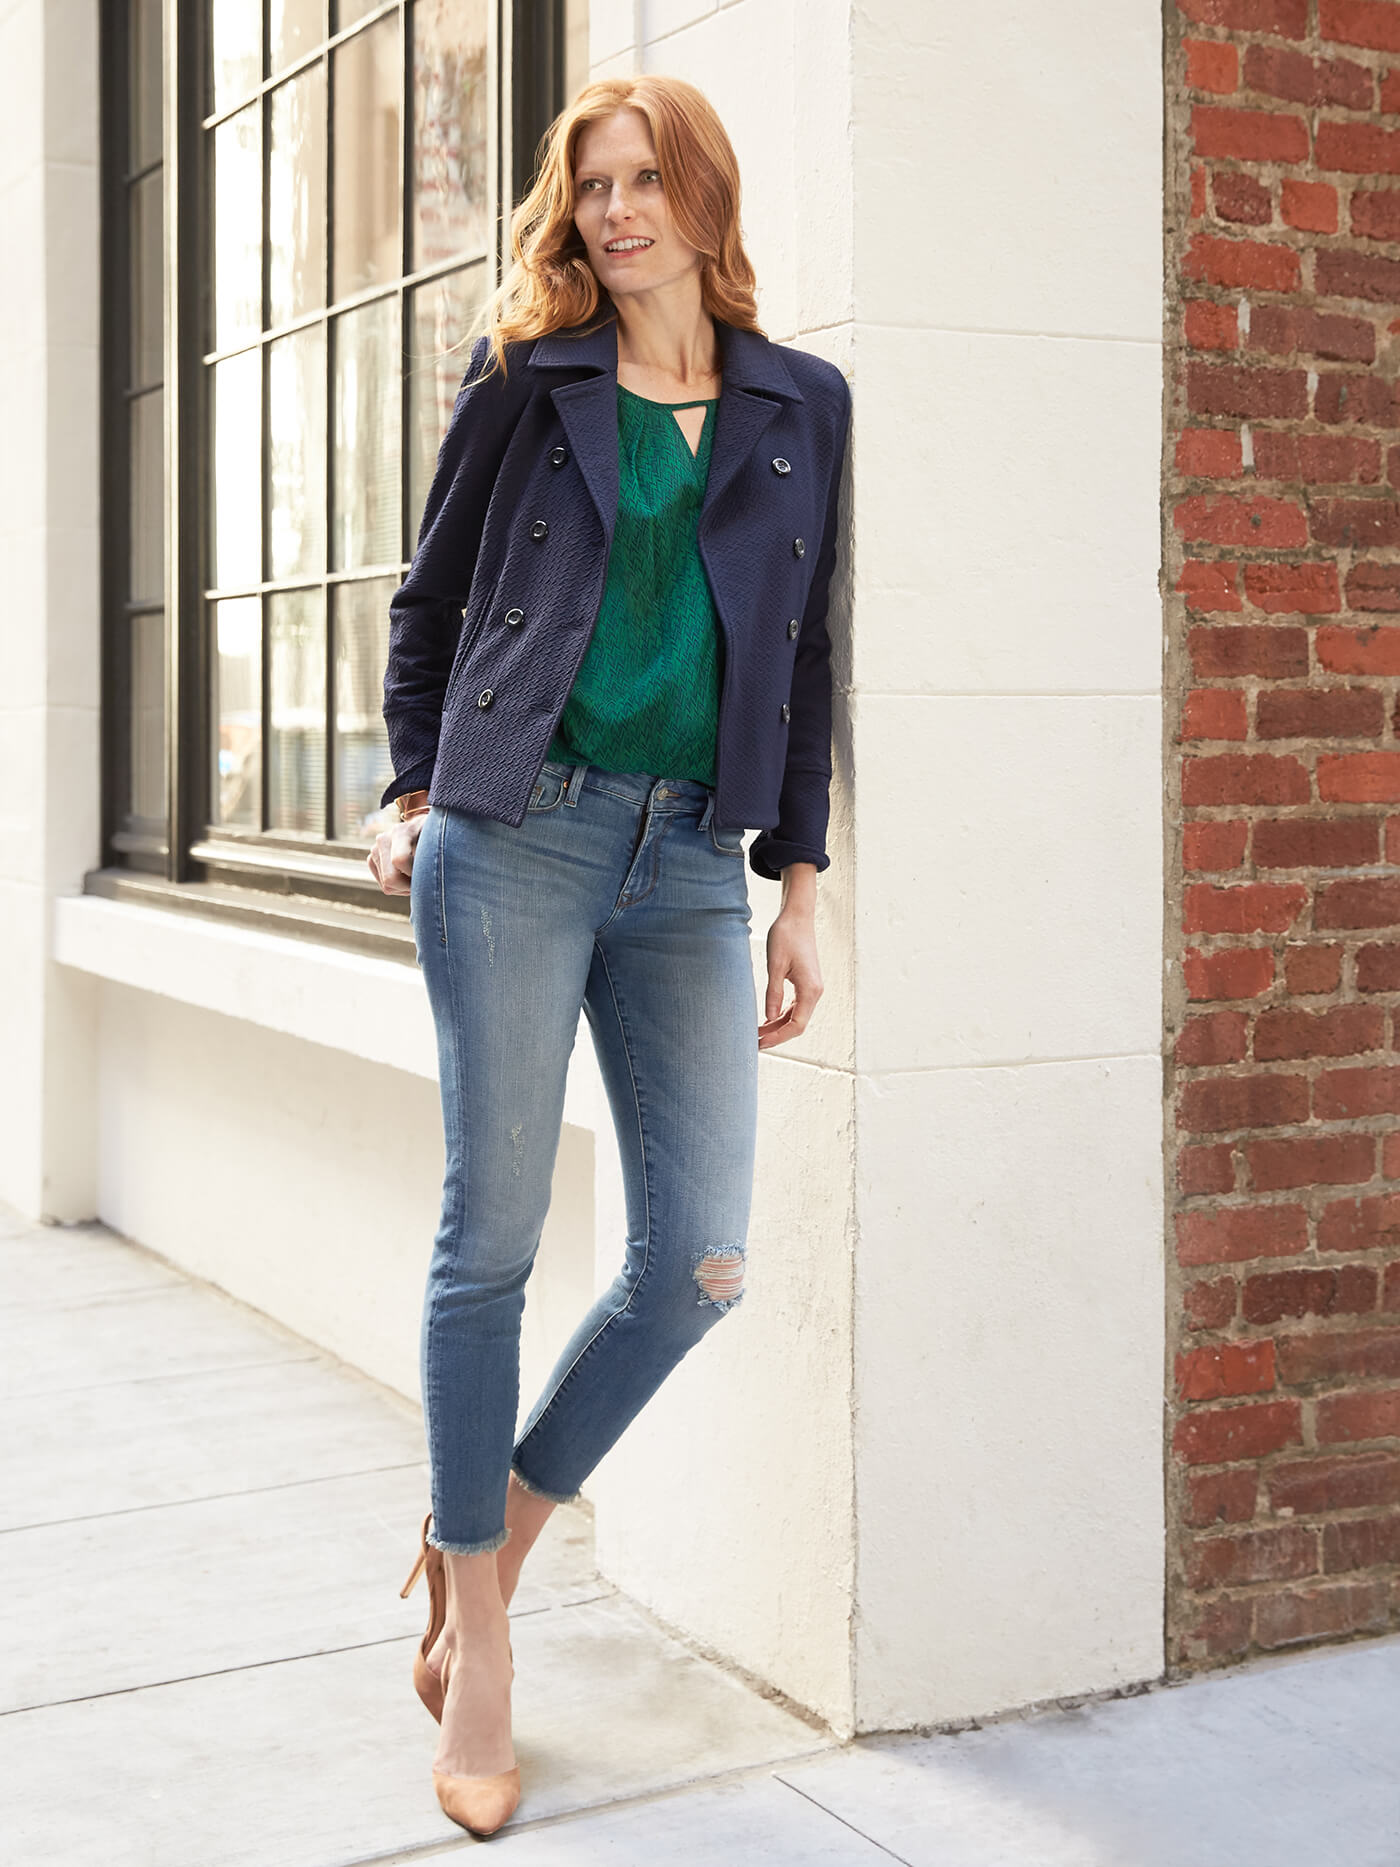 How to Wear Skinny Jeans with workwear